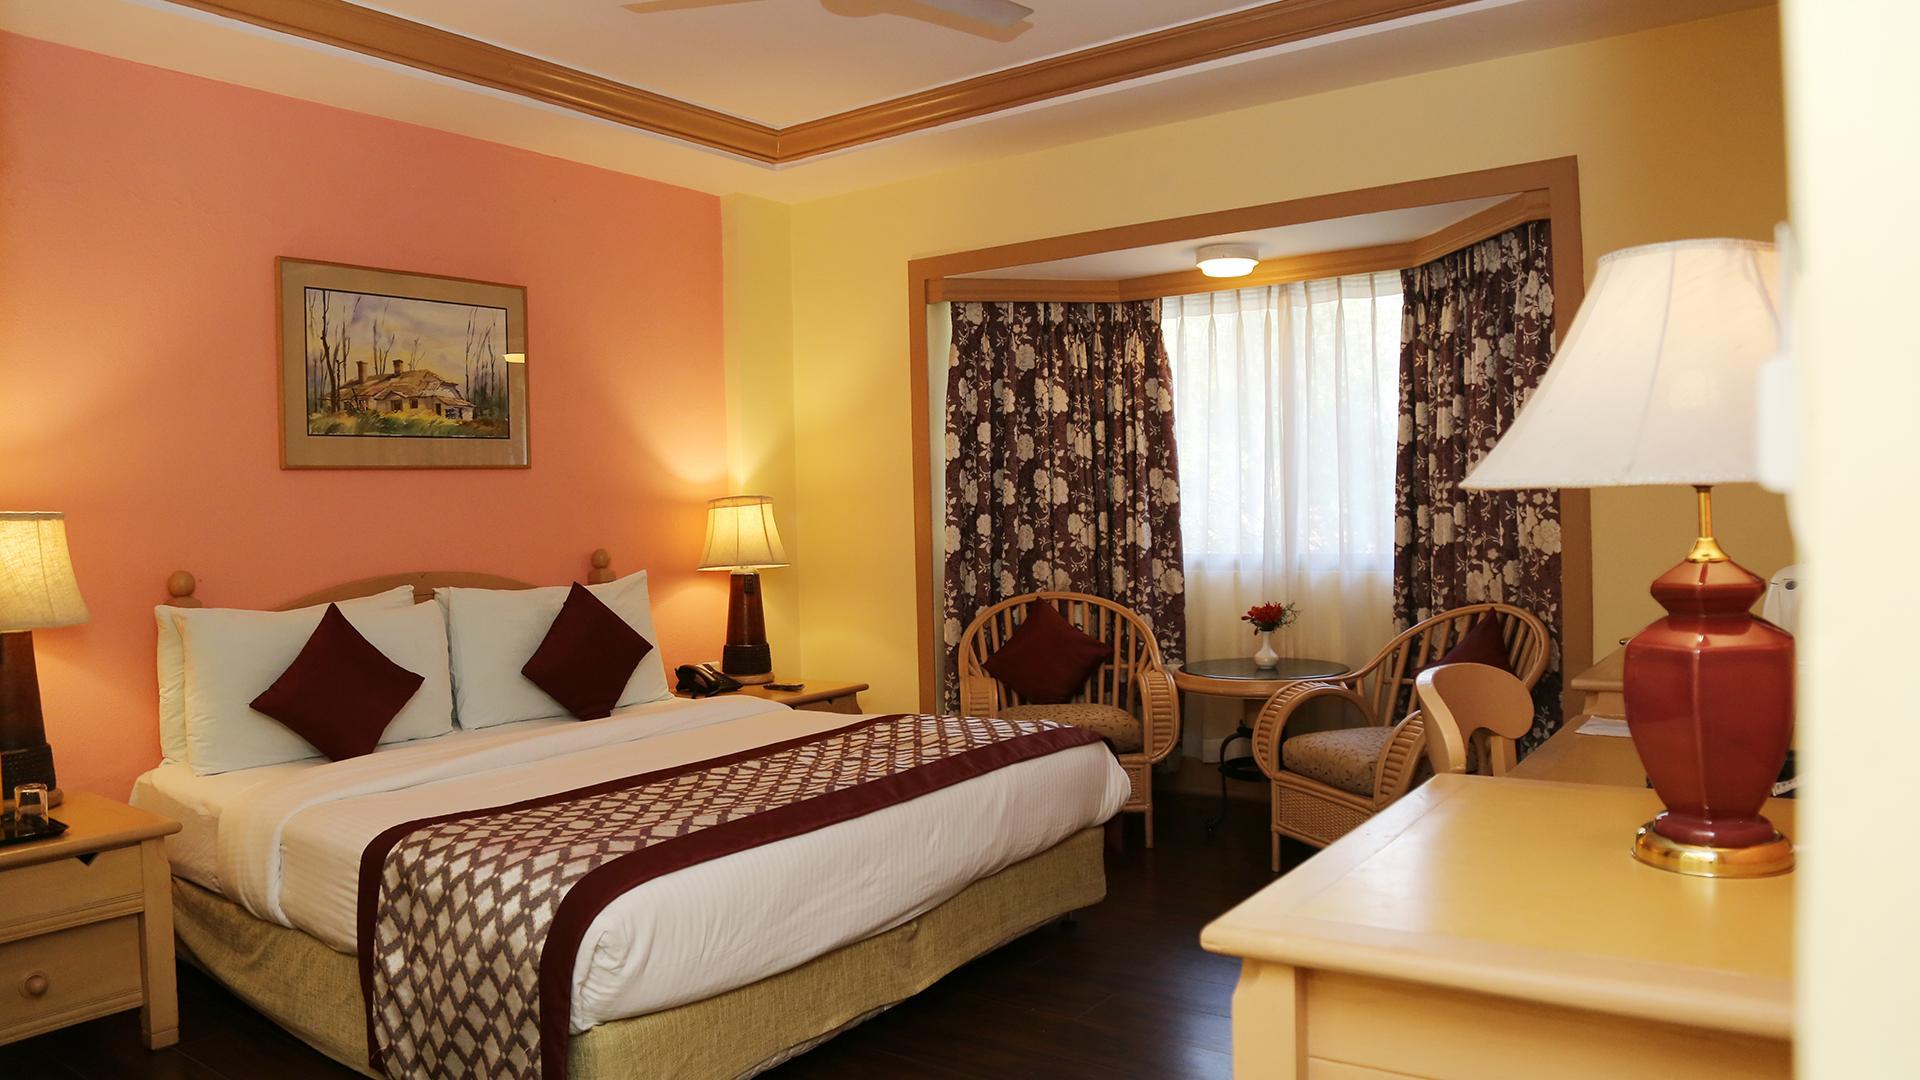 Fortune Club Room image 1 at Fortune Resort Sullivan Court, Ooty by Nilgiris, Tamil Nadu, India